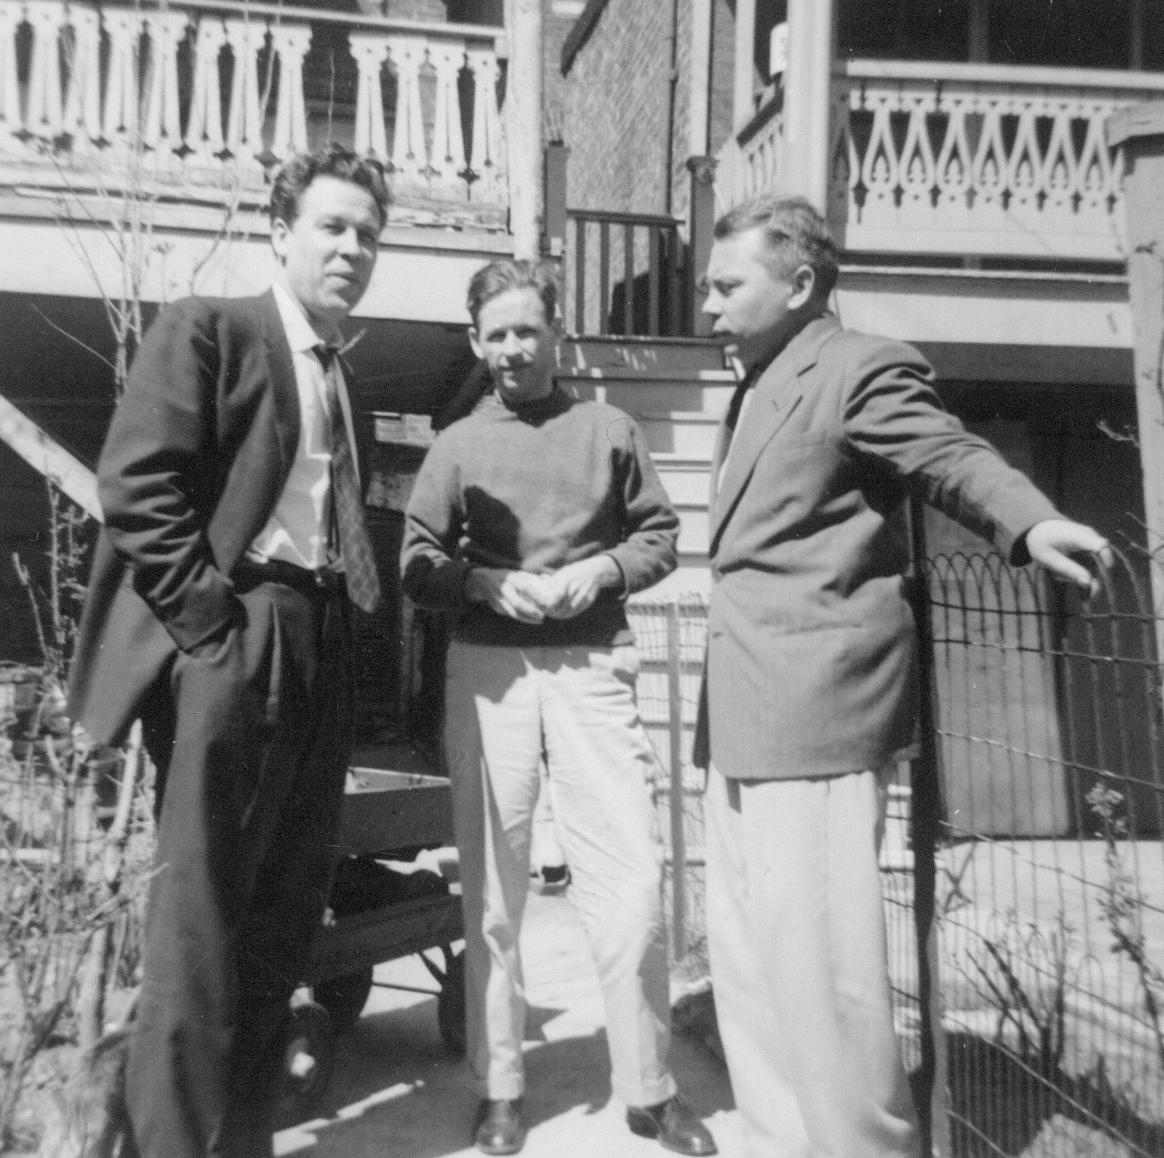 Iš kairės: H. Nagys, A. Nyka-Niliūnas ir K. Bradūnas. Baltimorė, 1952 m.